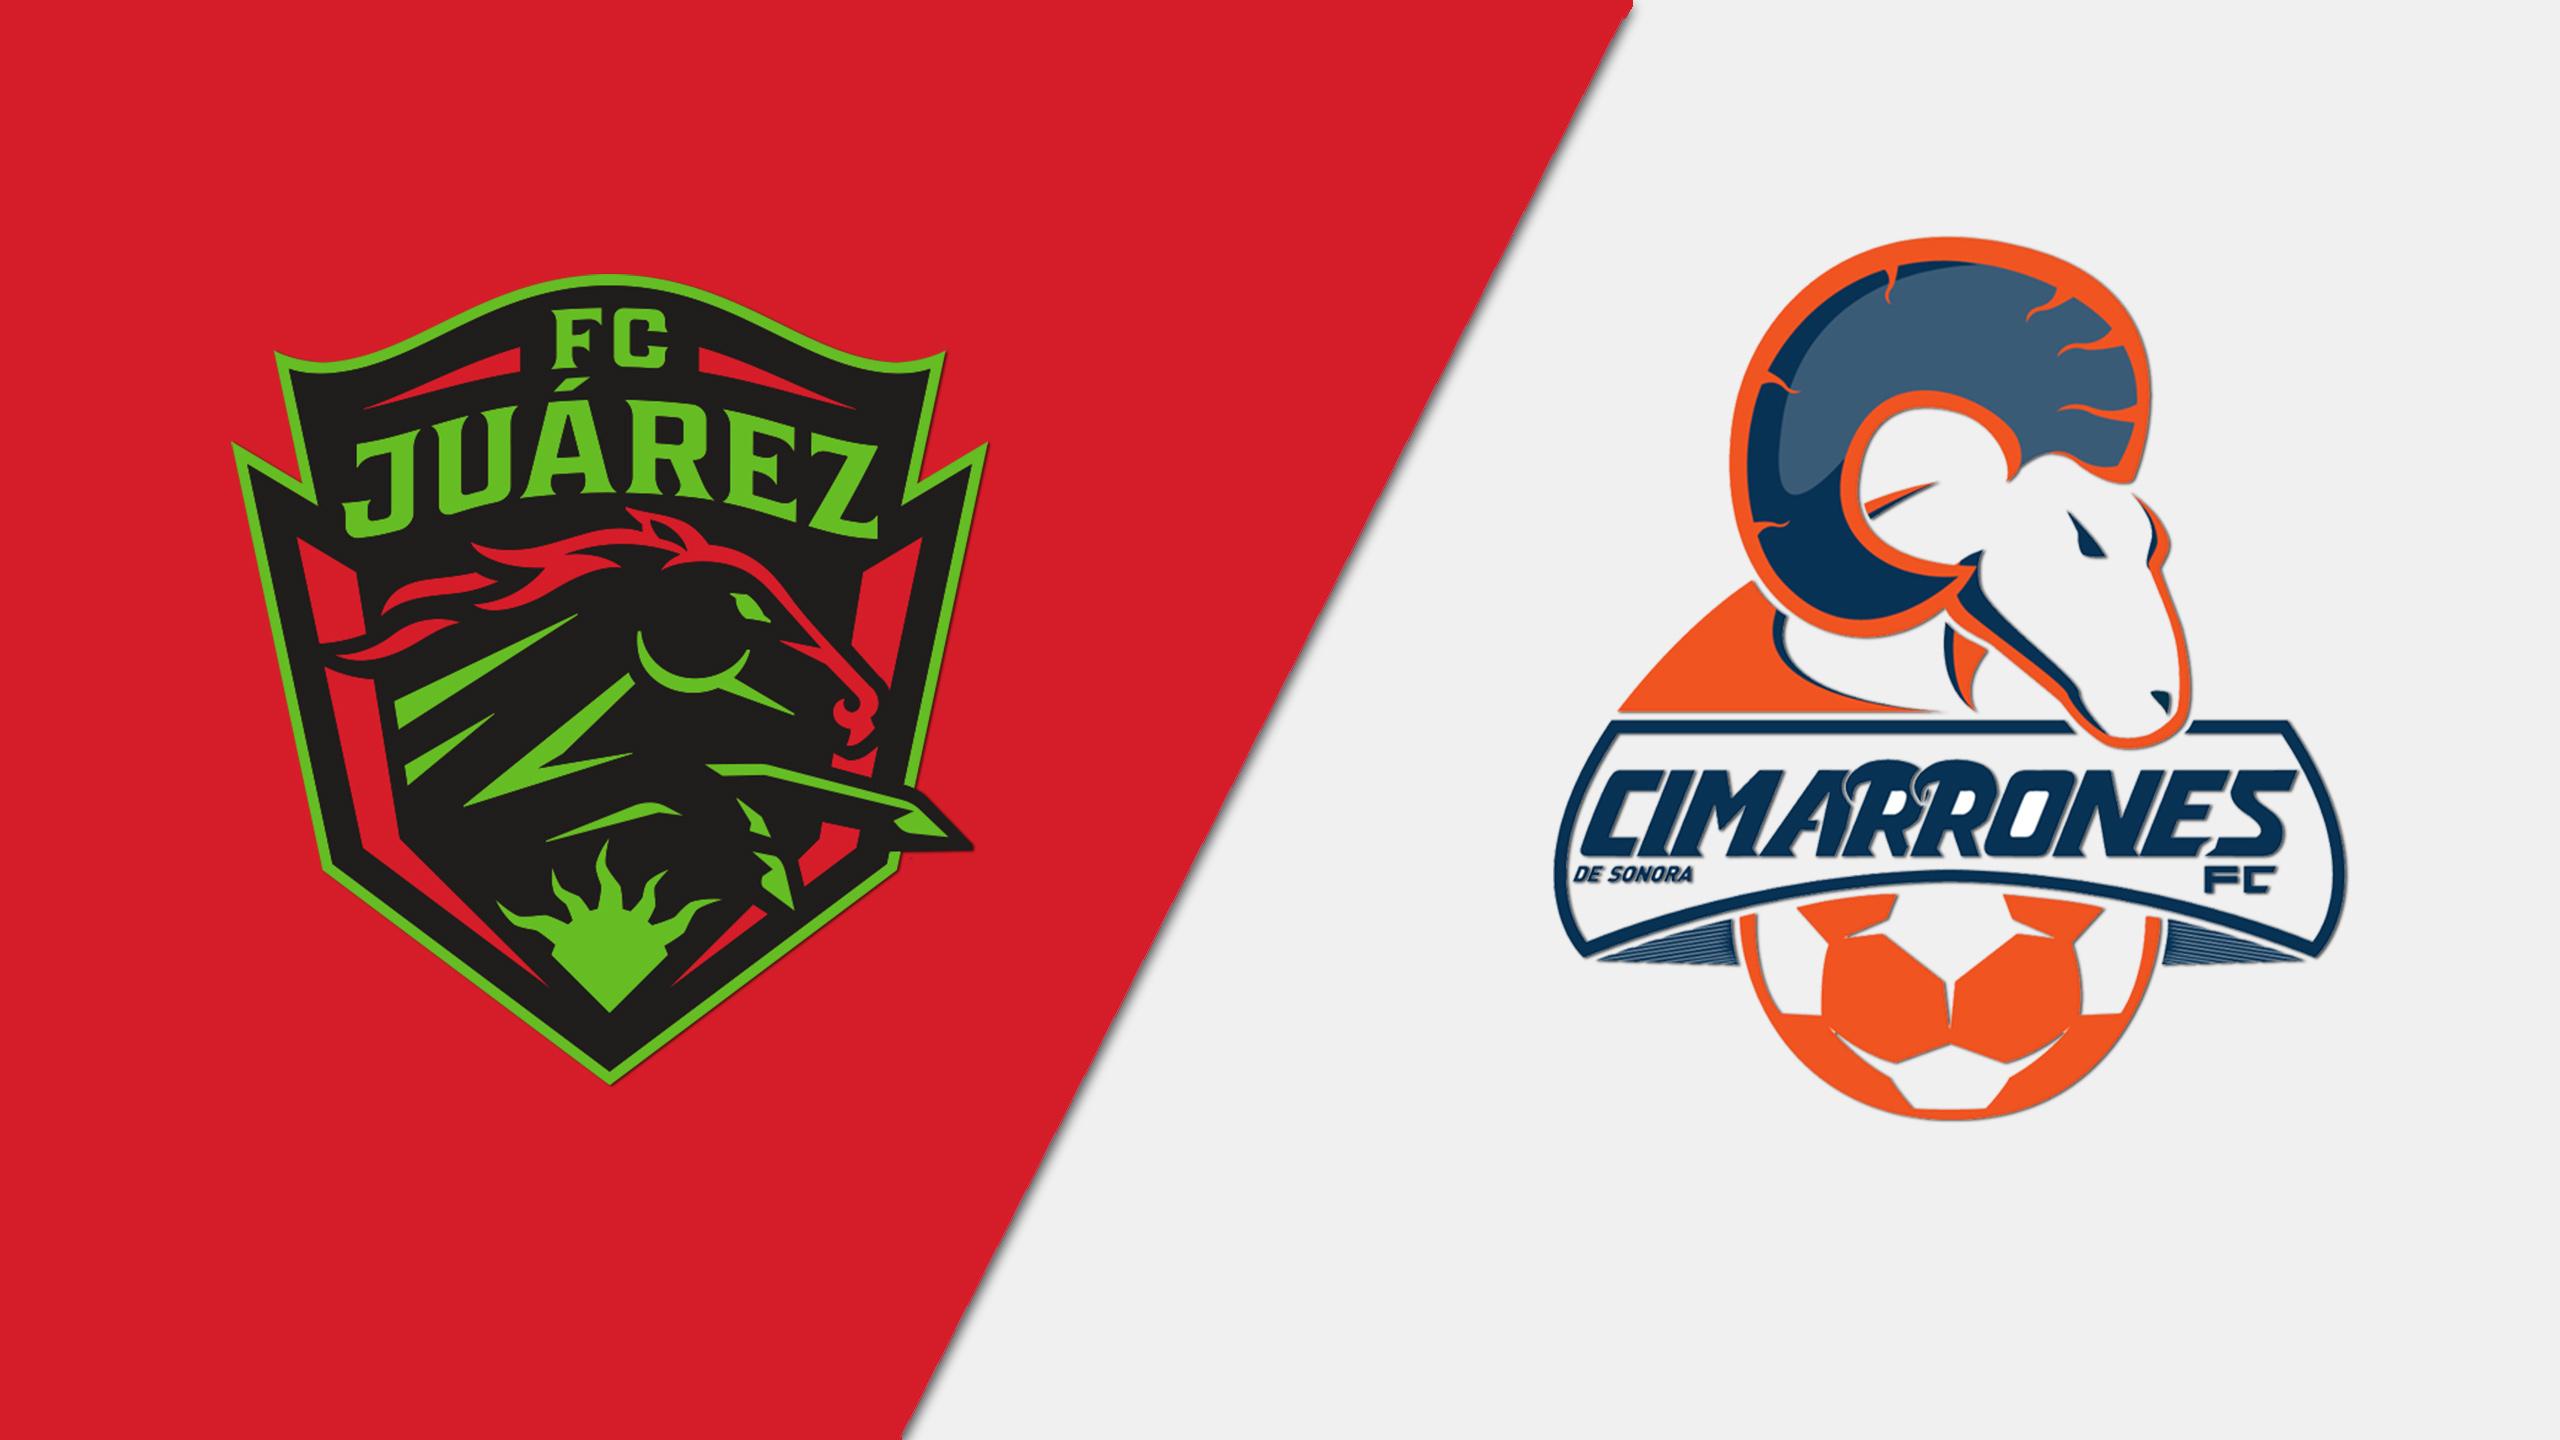 In Spanish - FC Juárez vs. Cimarrones de Sonora (Jornada 12)